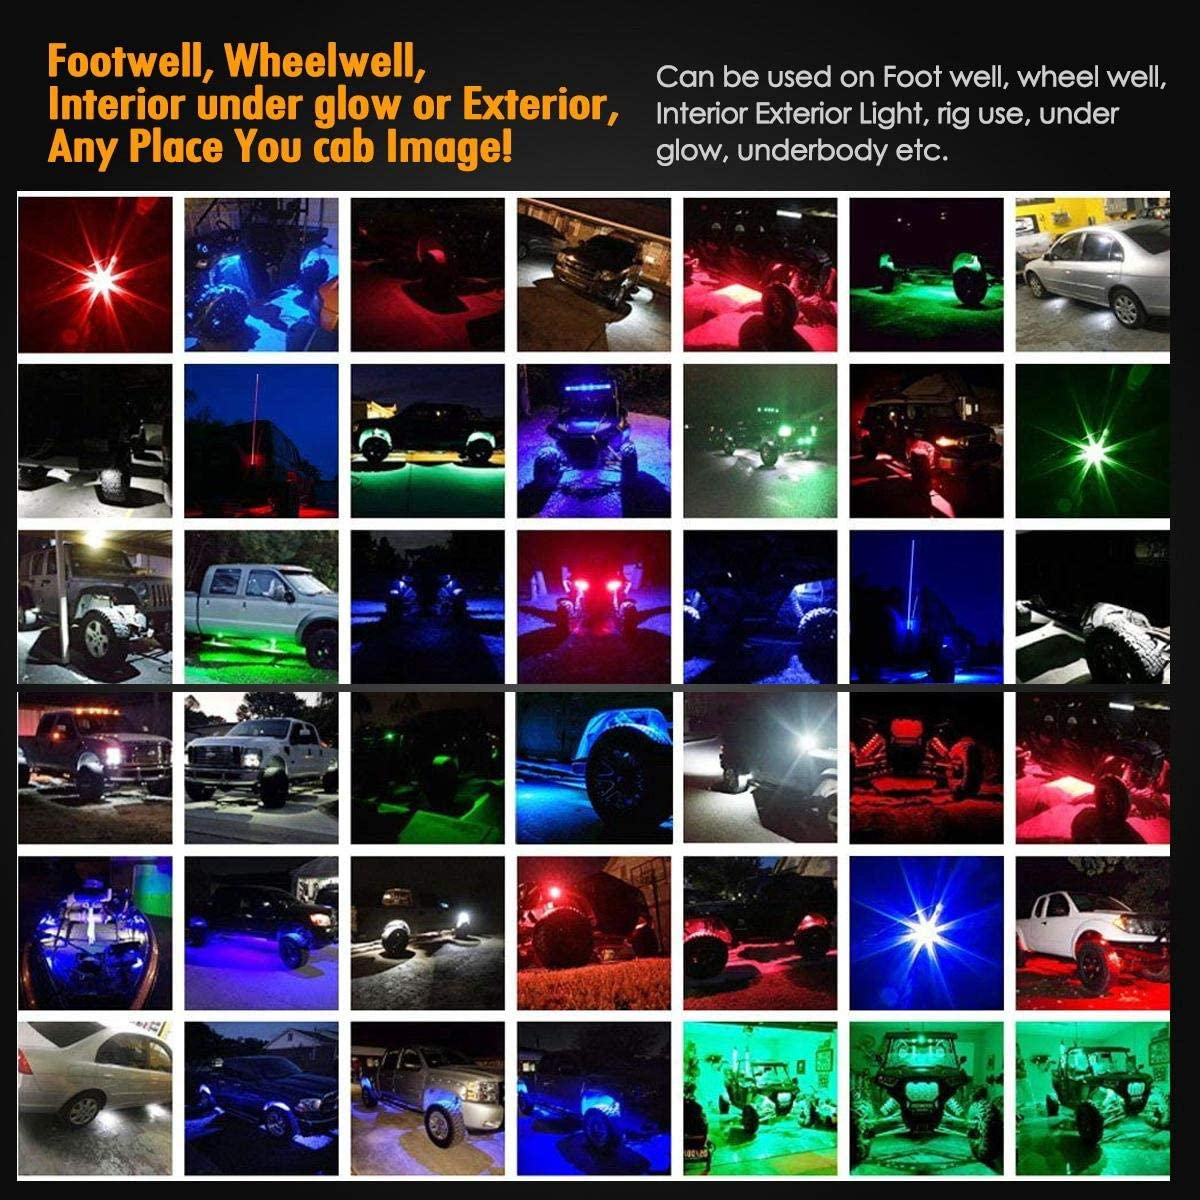 Green 8PCS Partsam 8 Pods LED Rock Light Kits Compatible with Jeep TJ JK F150 F250 Truck Boat Lamp Camper RV ATV UTV RZR Ranger Yamaha Viking Teryx Mule Under Body Glow Footwell Fender Wheeler